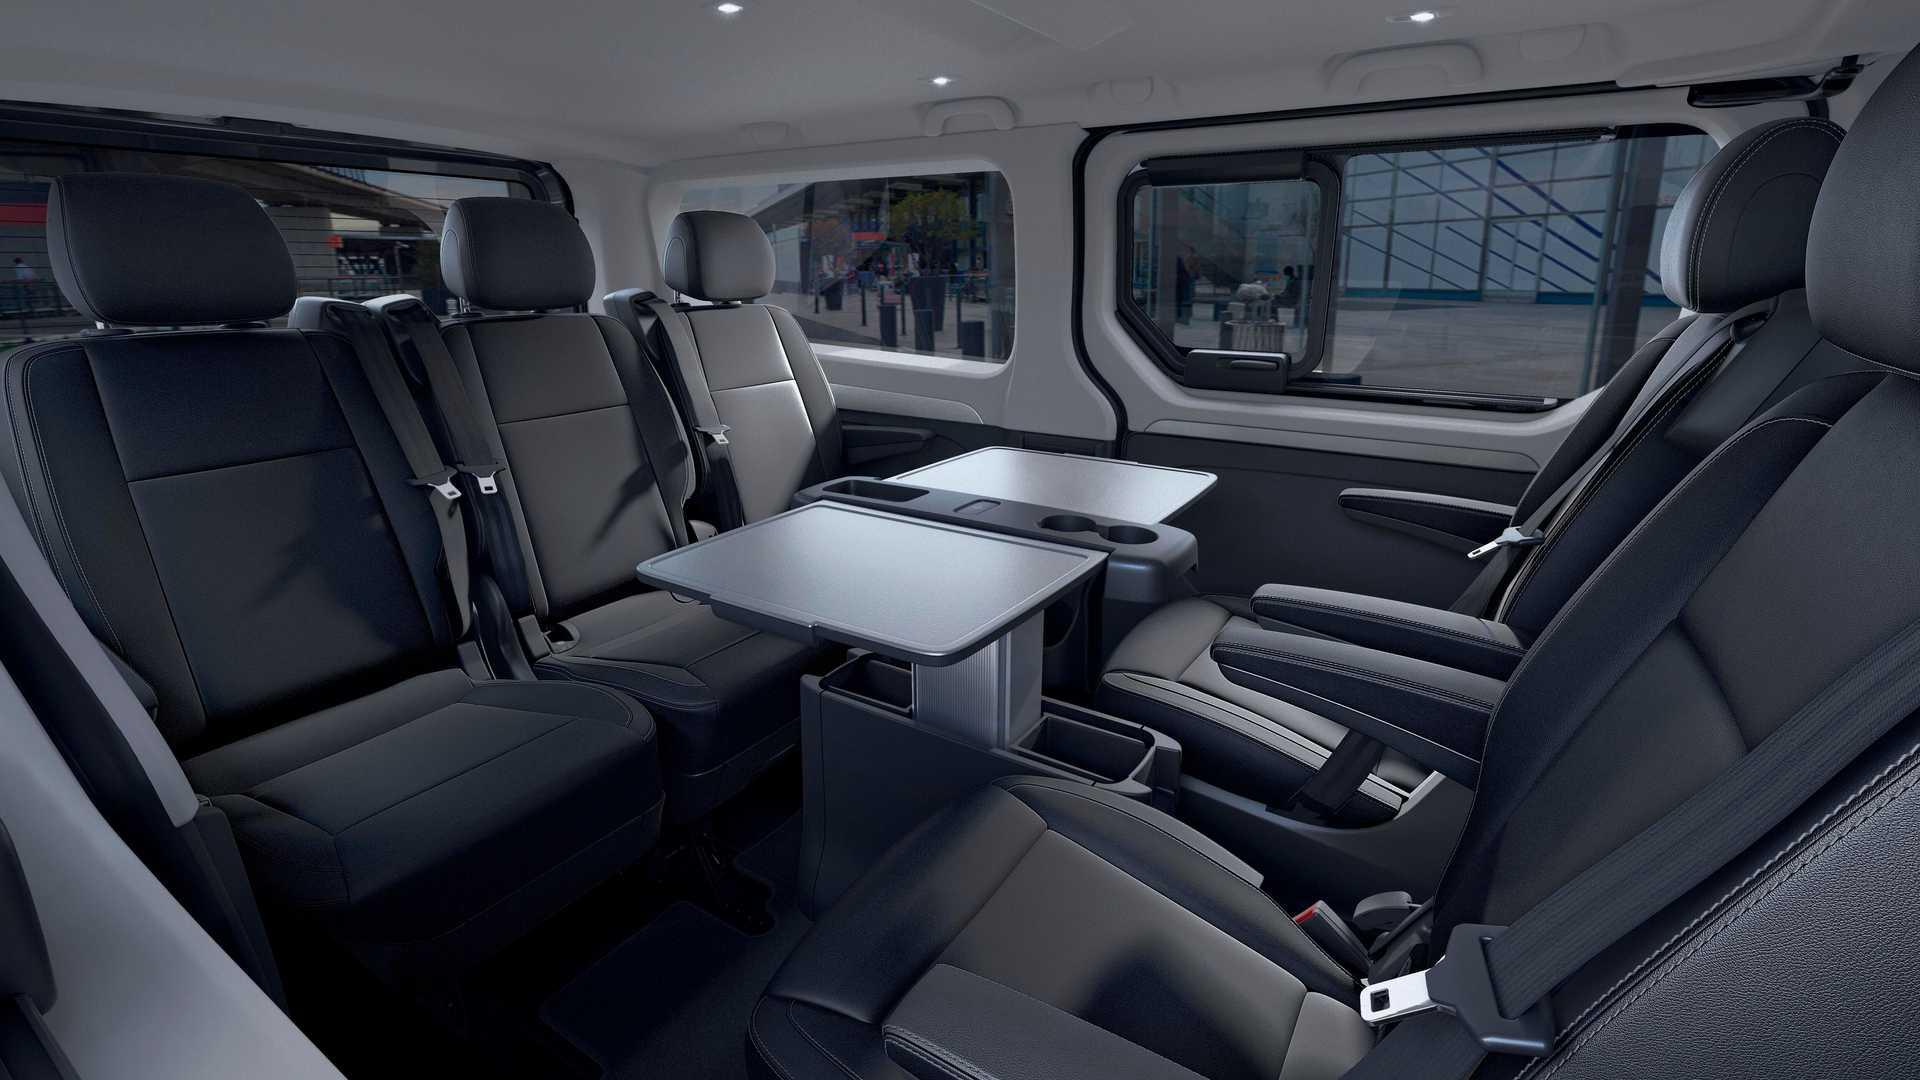 2020-renault-trafic-facelift-interior (1)